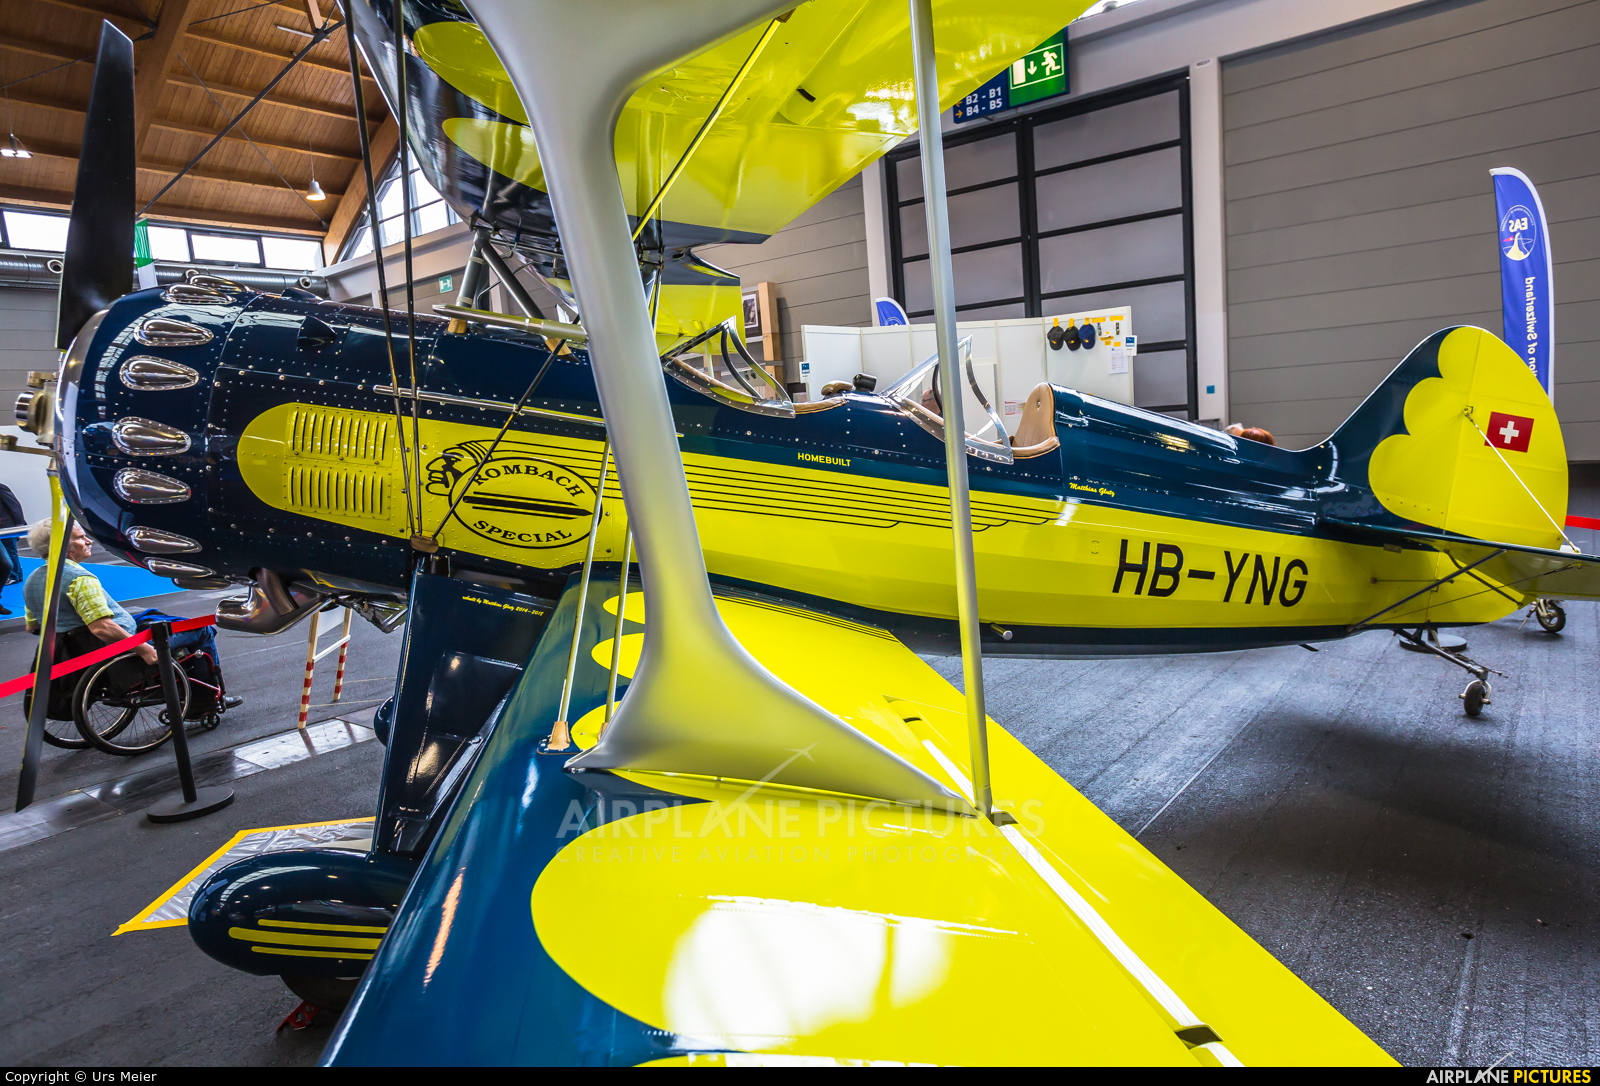 HB-YNG aircraft at Friedrichshafen